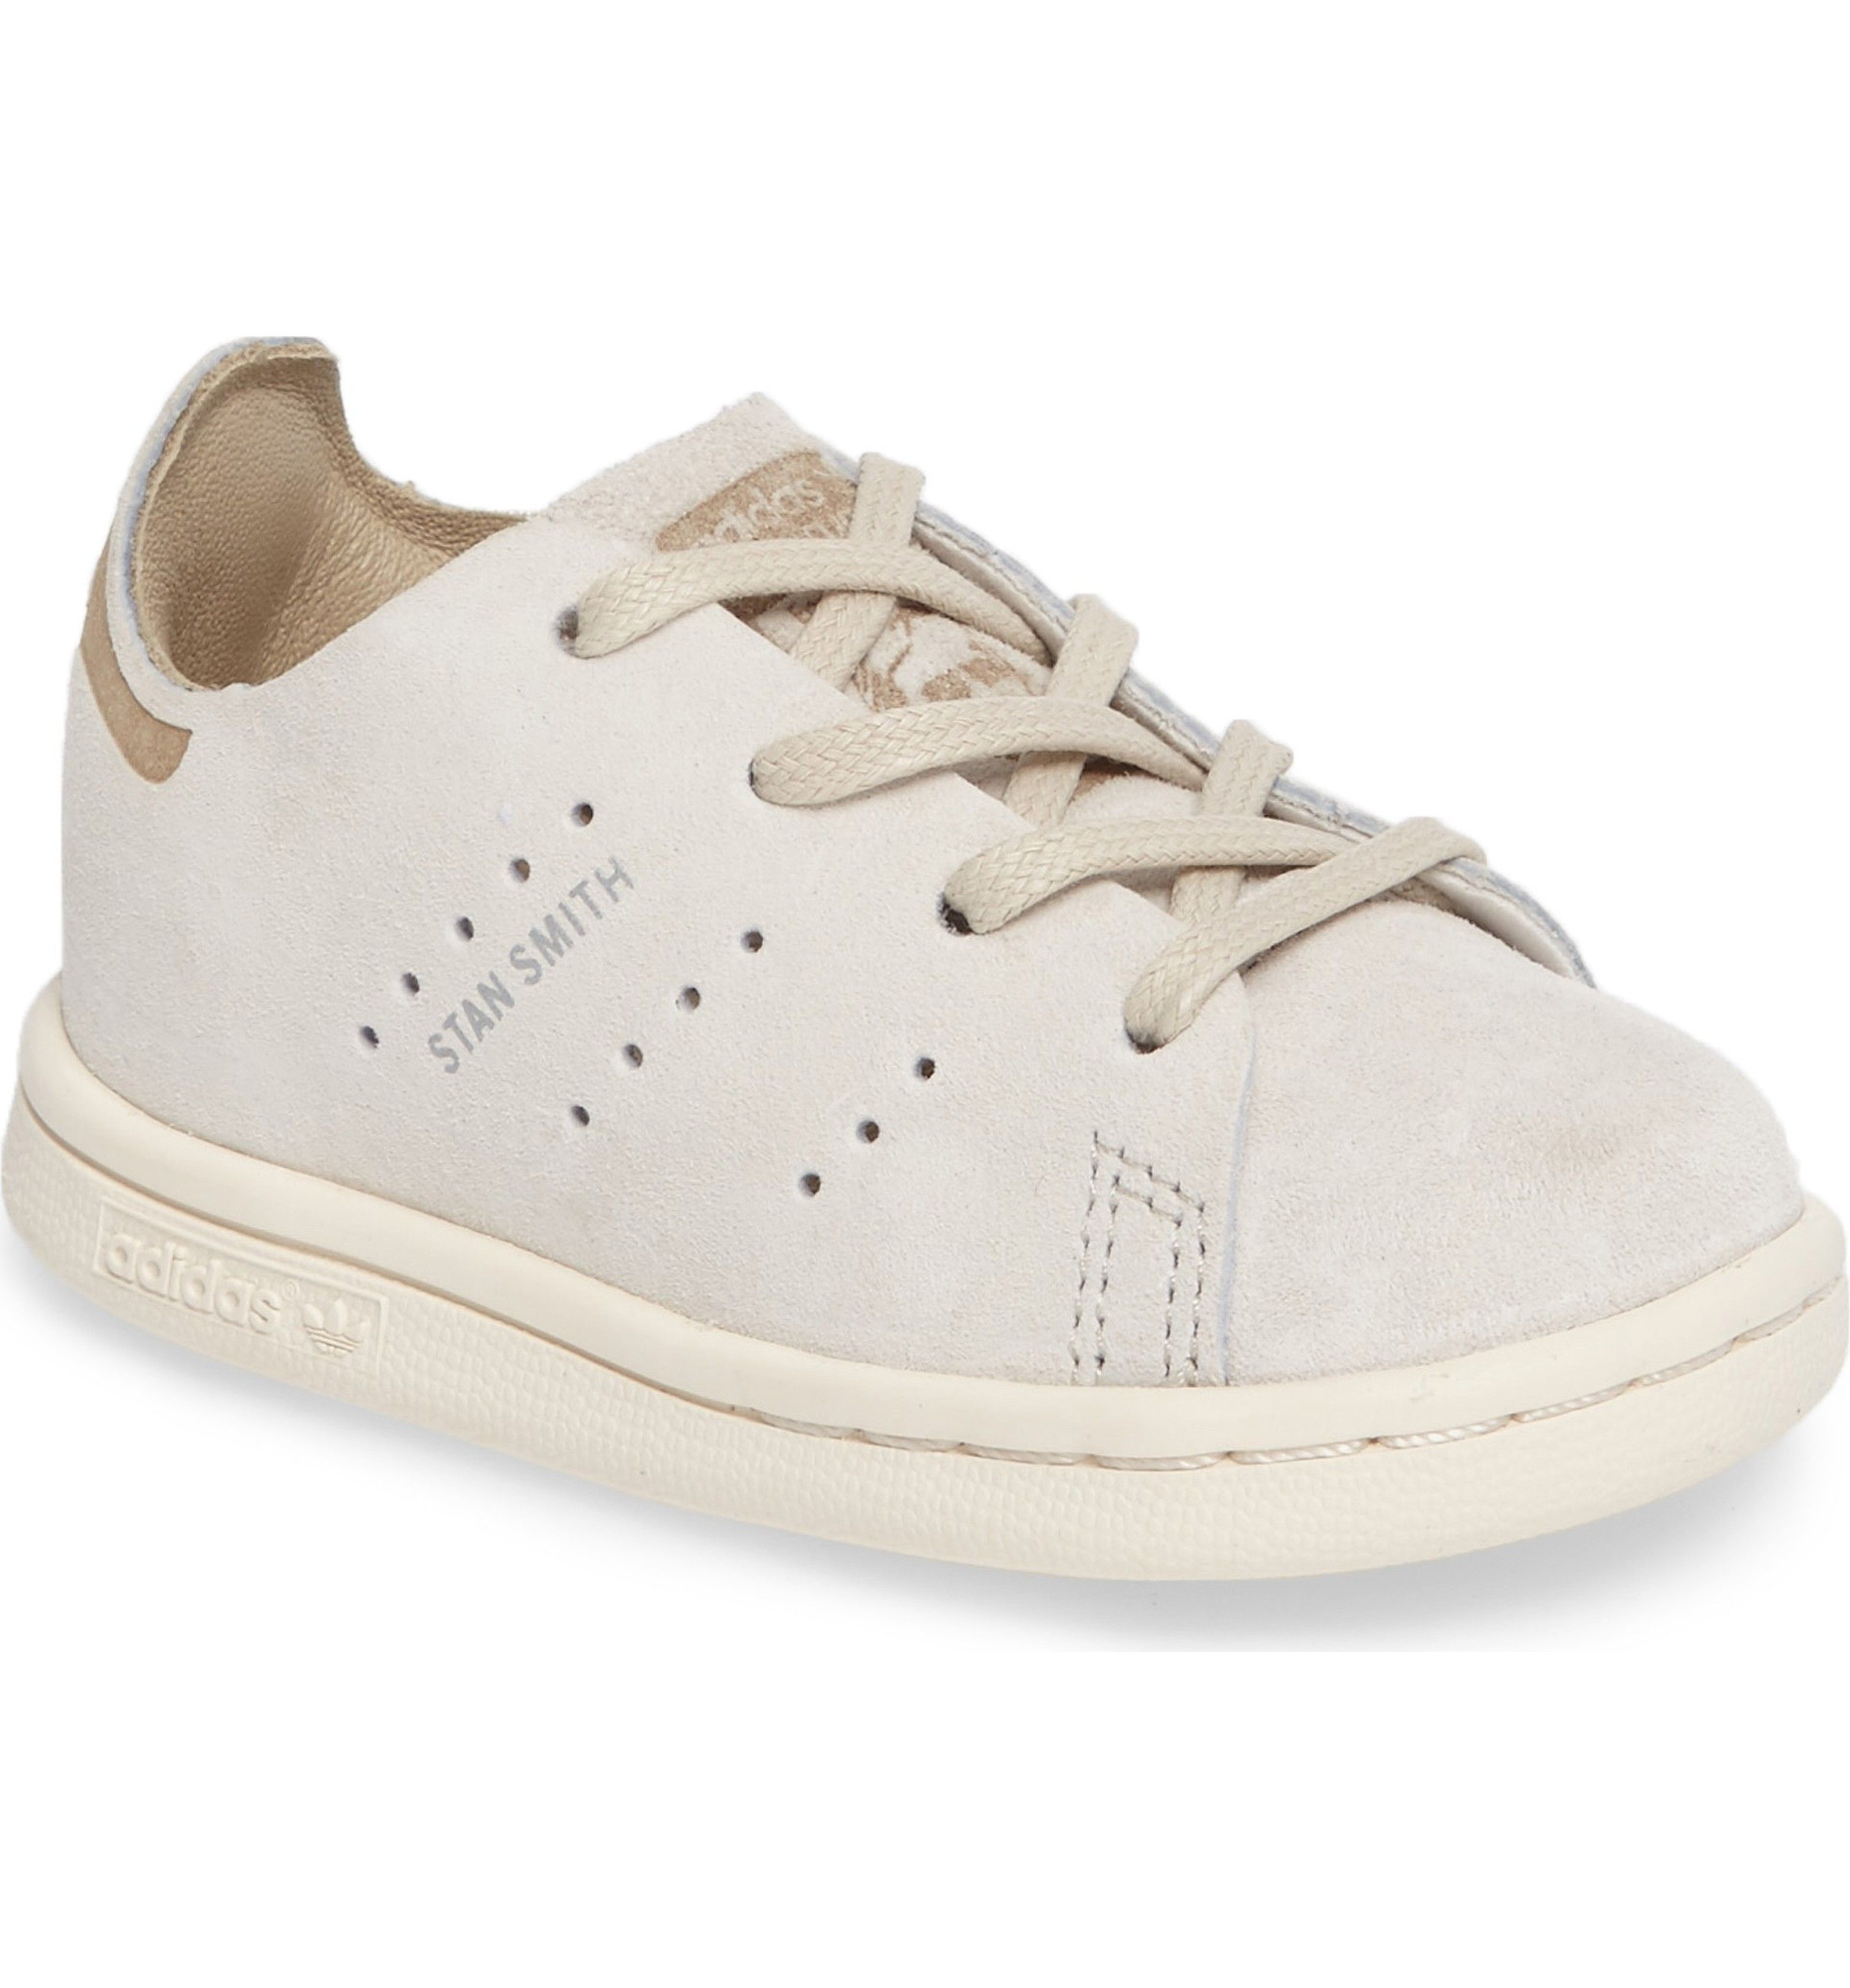 Main Image - adidas Stan Smith Fashion I Sneaker (Baby, Walker \u0026 Toddler)